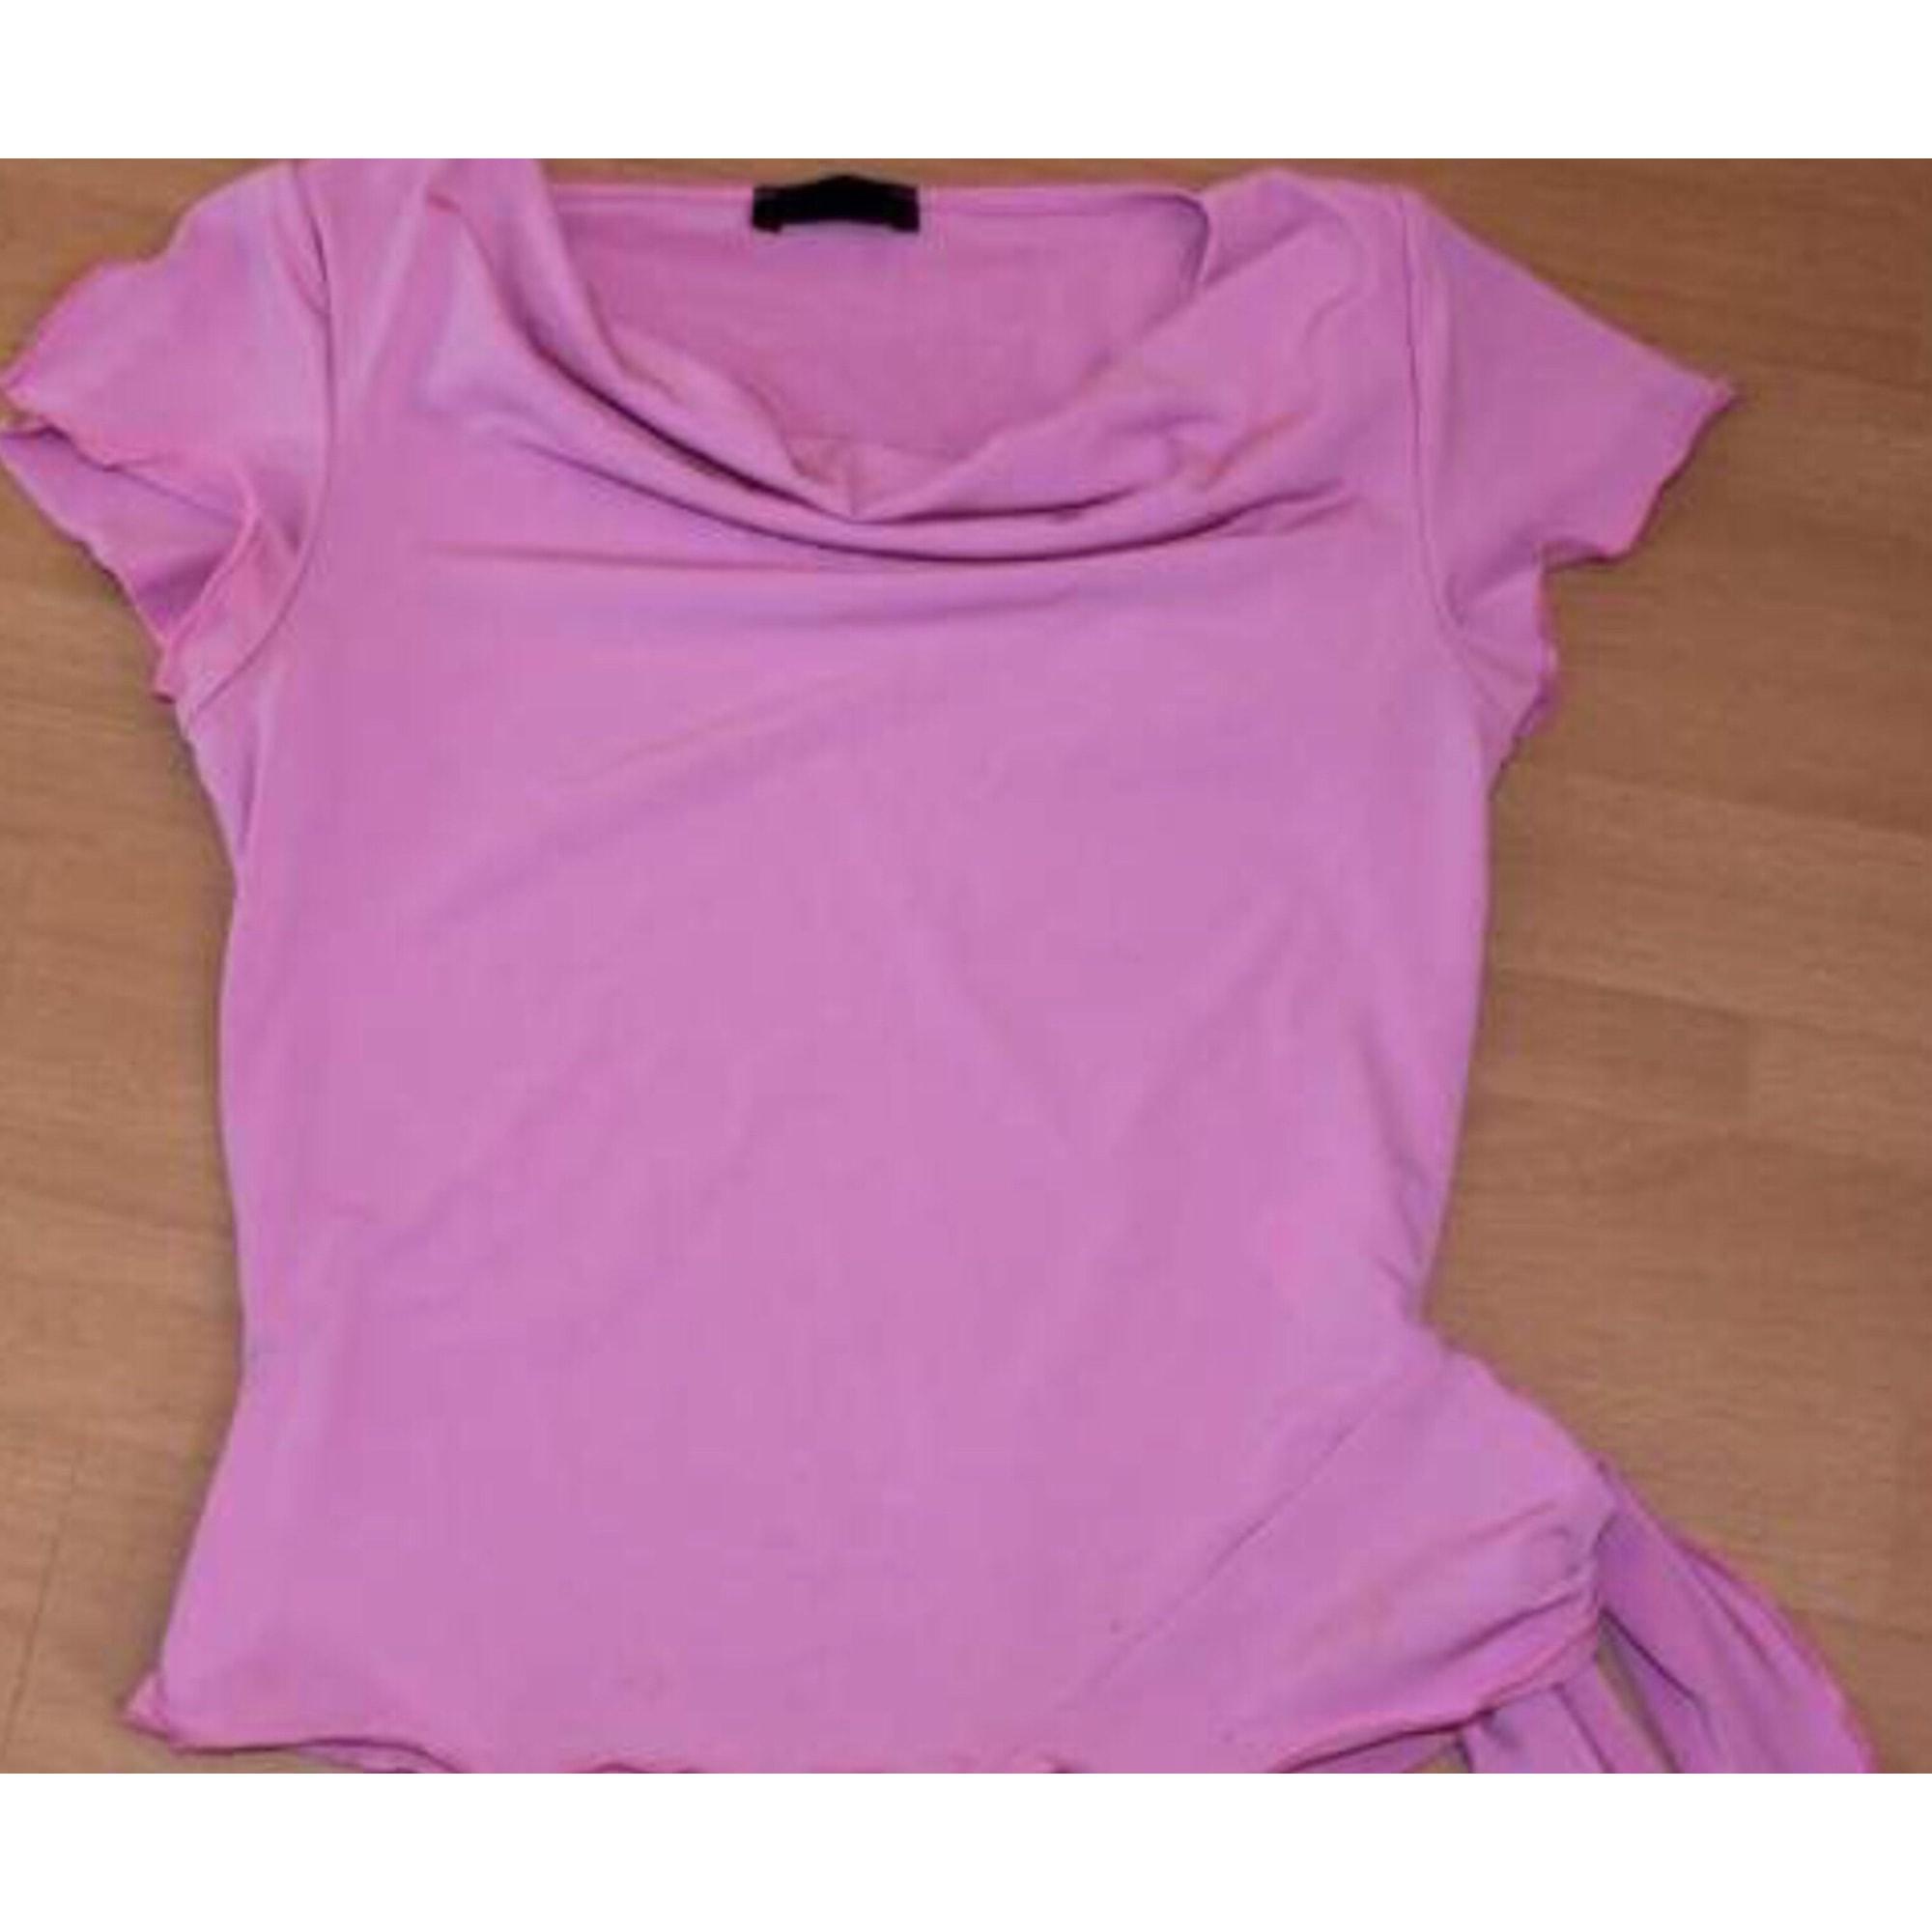 Top, tee-shirt INOÉ TSUHO Rose, fuschia, vieux rose